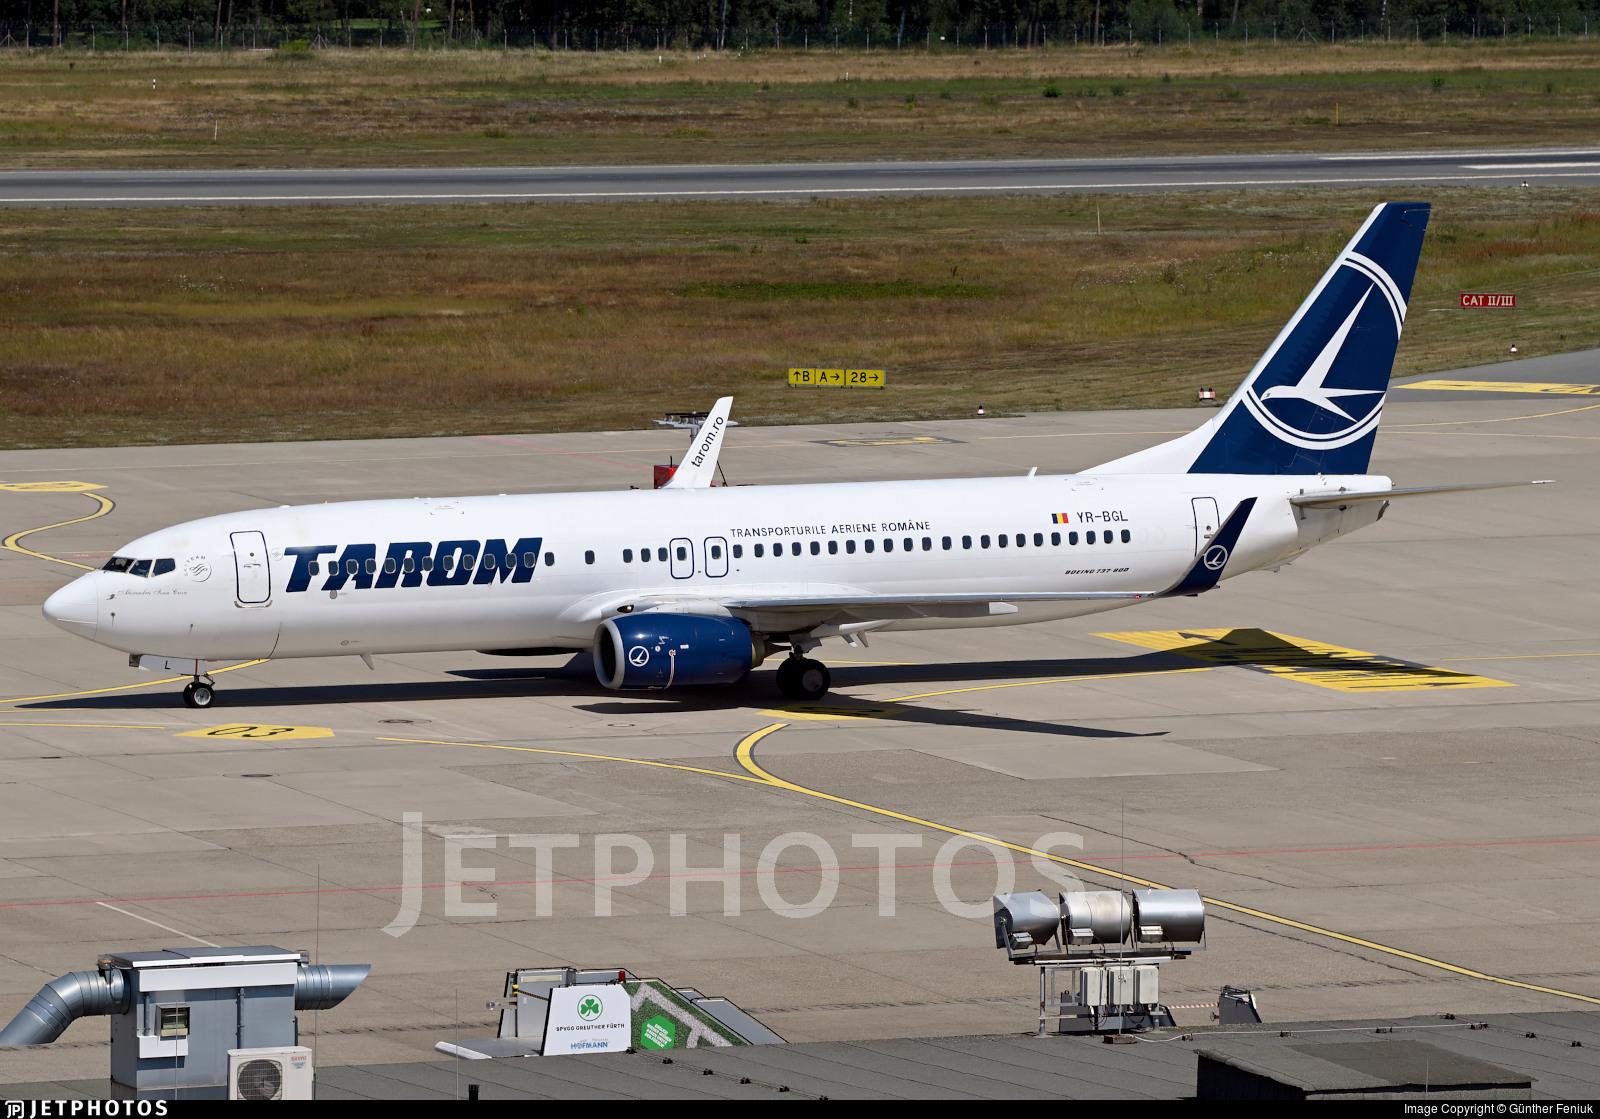 YR-BGL - Boeing 737-8H6 - Tarom - Romanian Air Transport